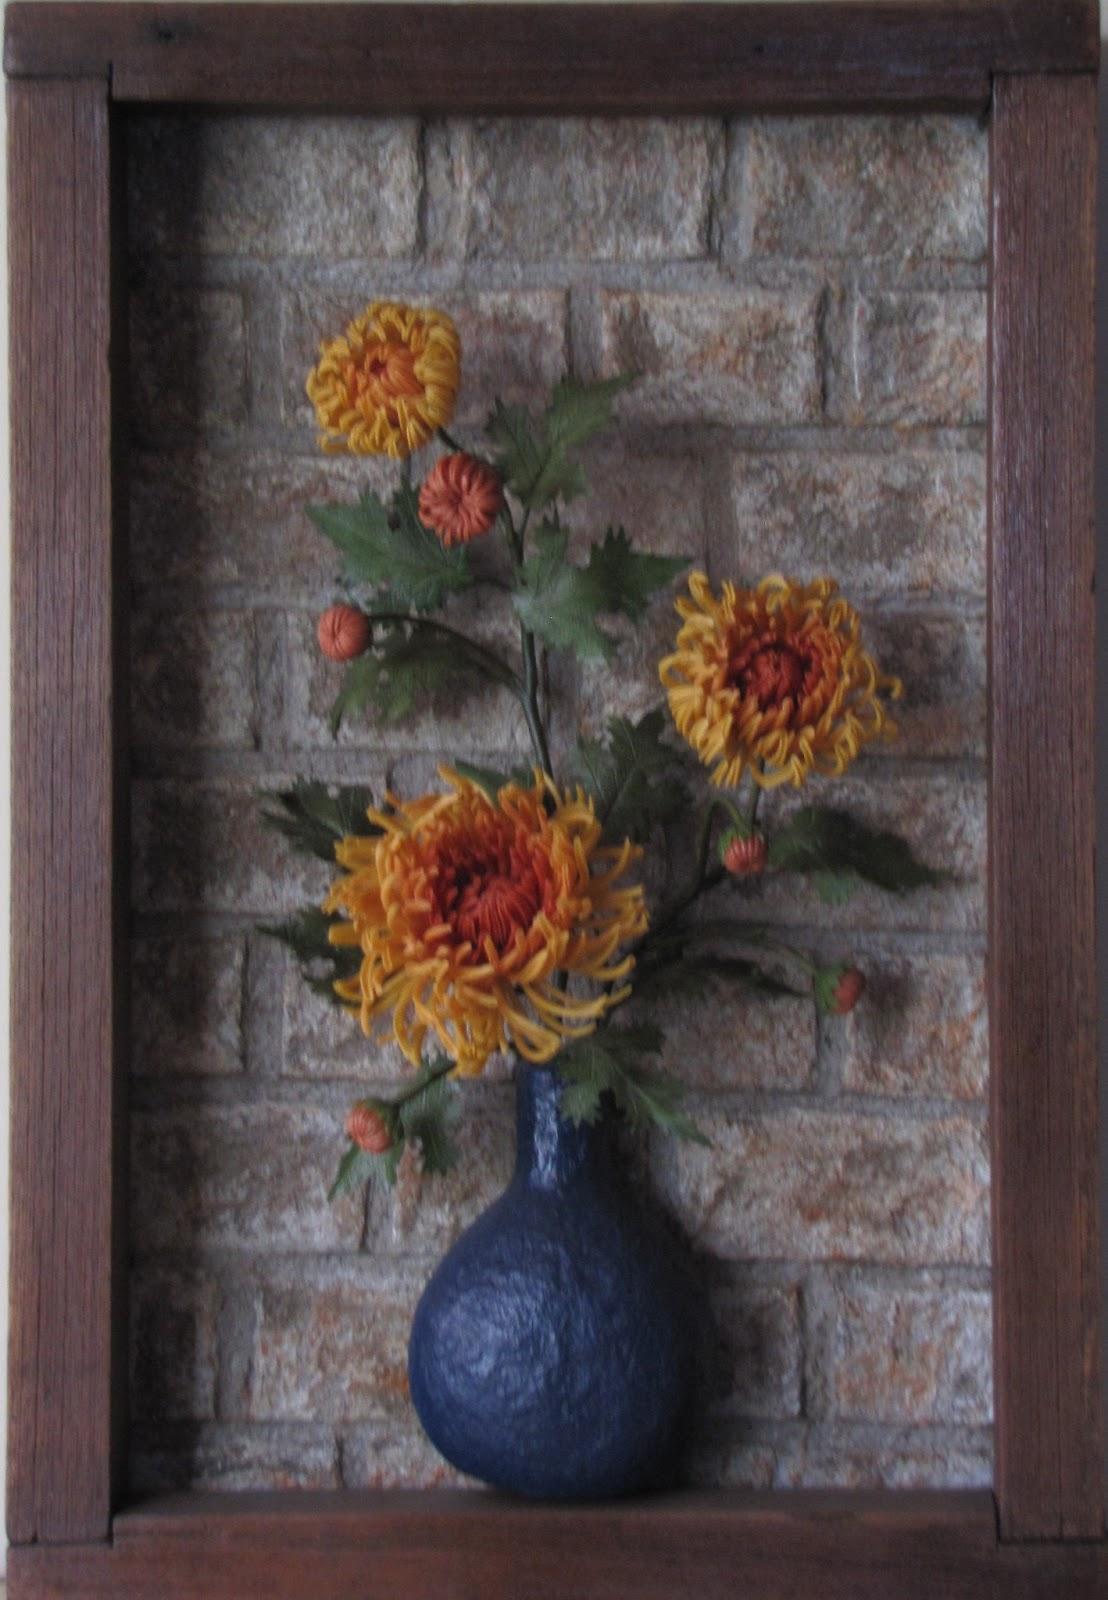 Rubi montejo cuadro alto relieve crisantemos alto for Cuadros con corchos